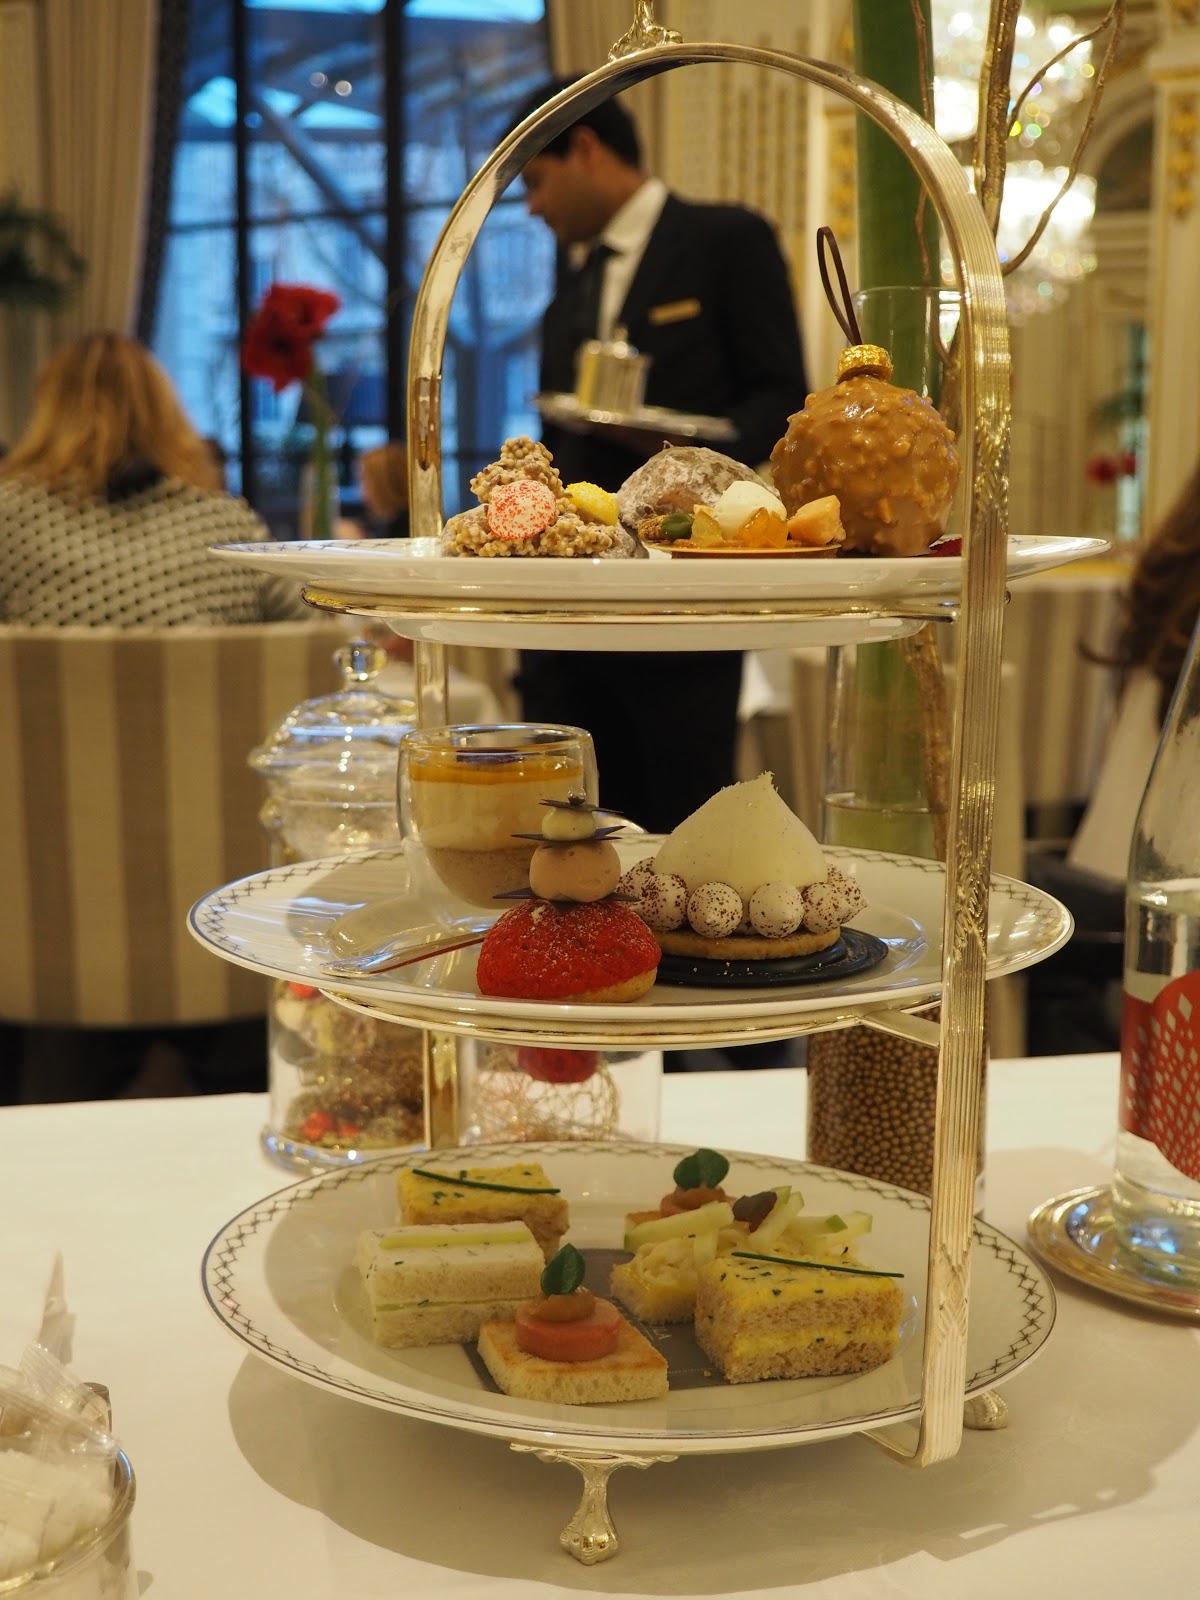 Peninsula Hotel, Paris, Afternoon Tea